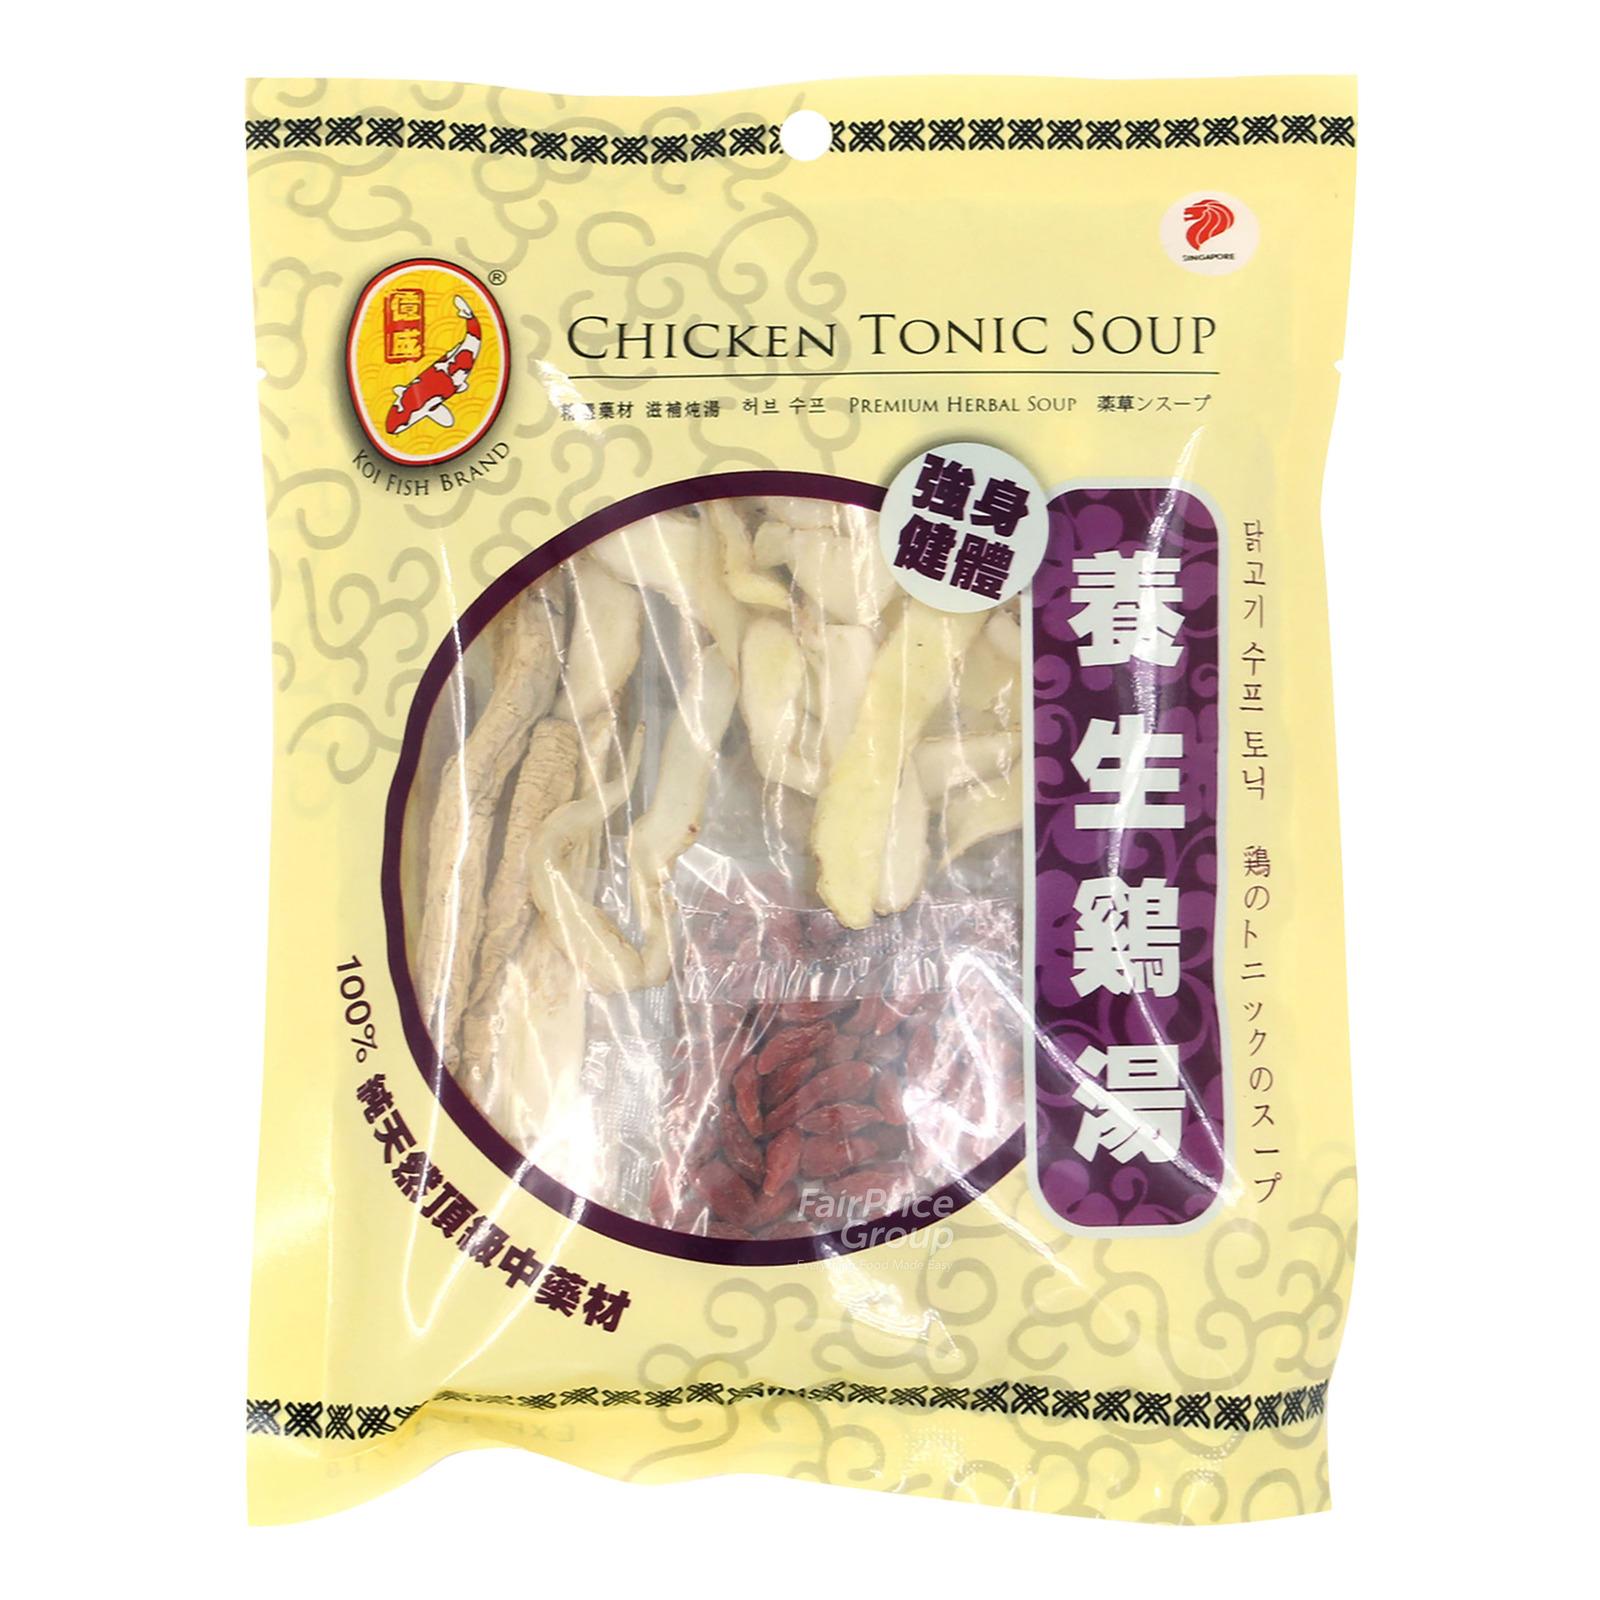 Koi Fish Brand Herbal Soup - Chicken Tonic